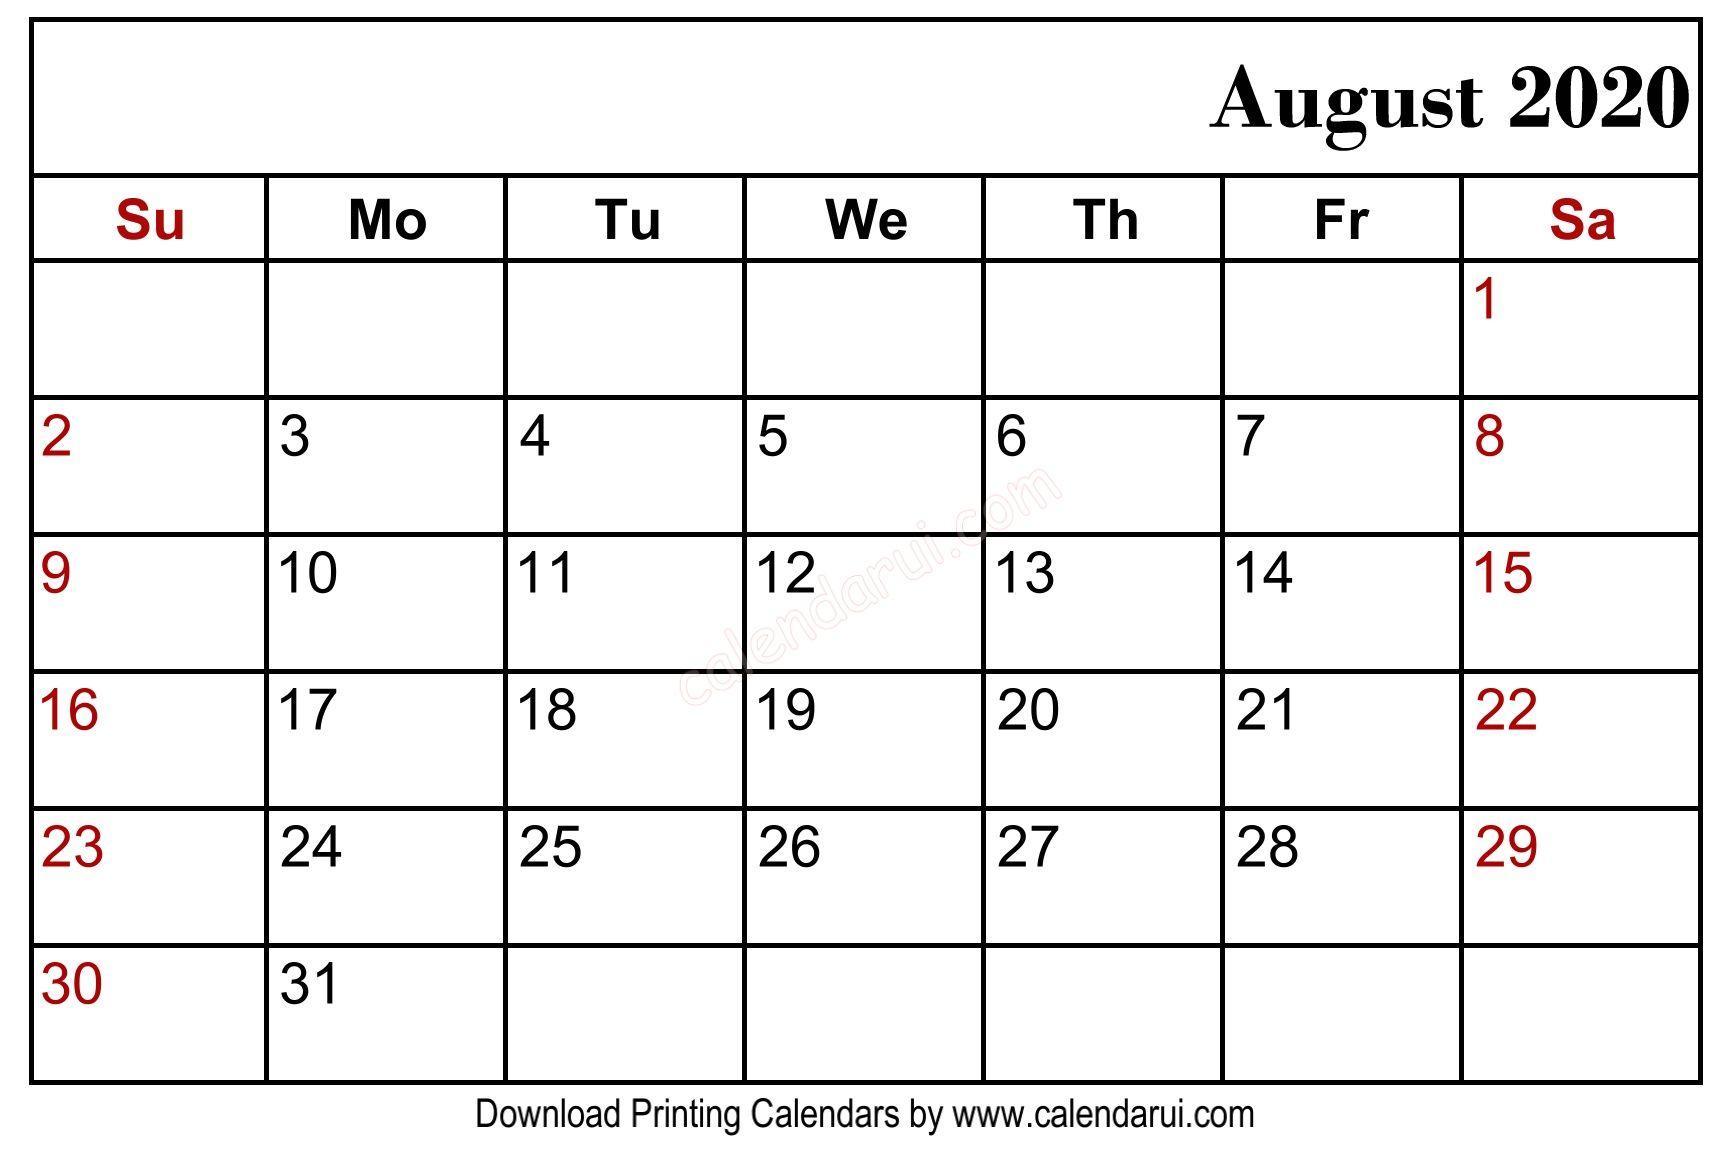 Free Printable Editable Calendar August 2020